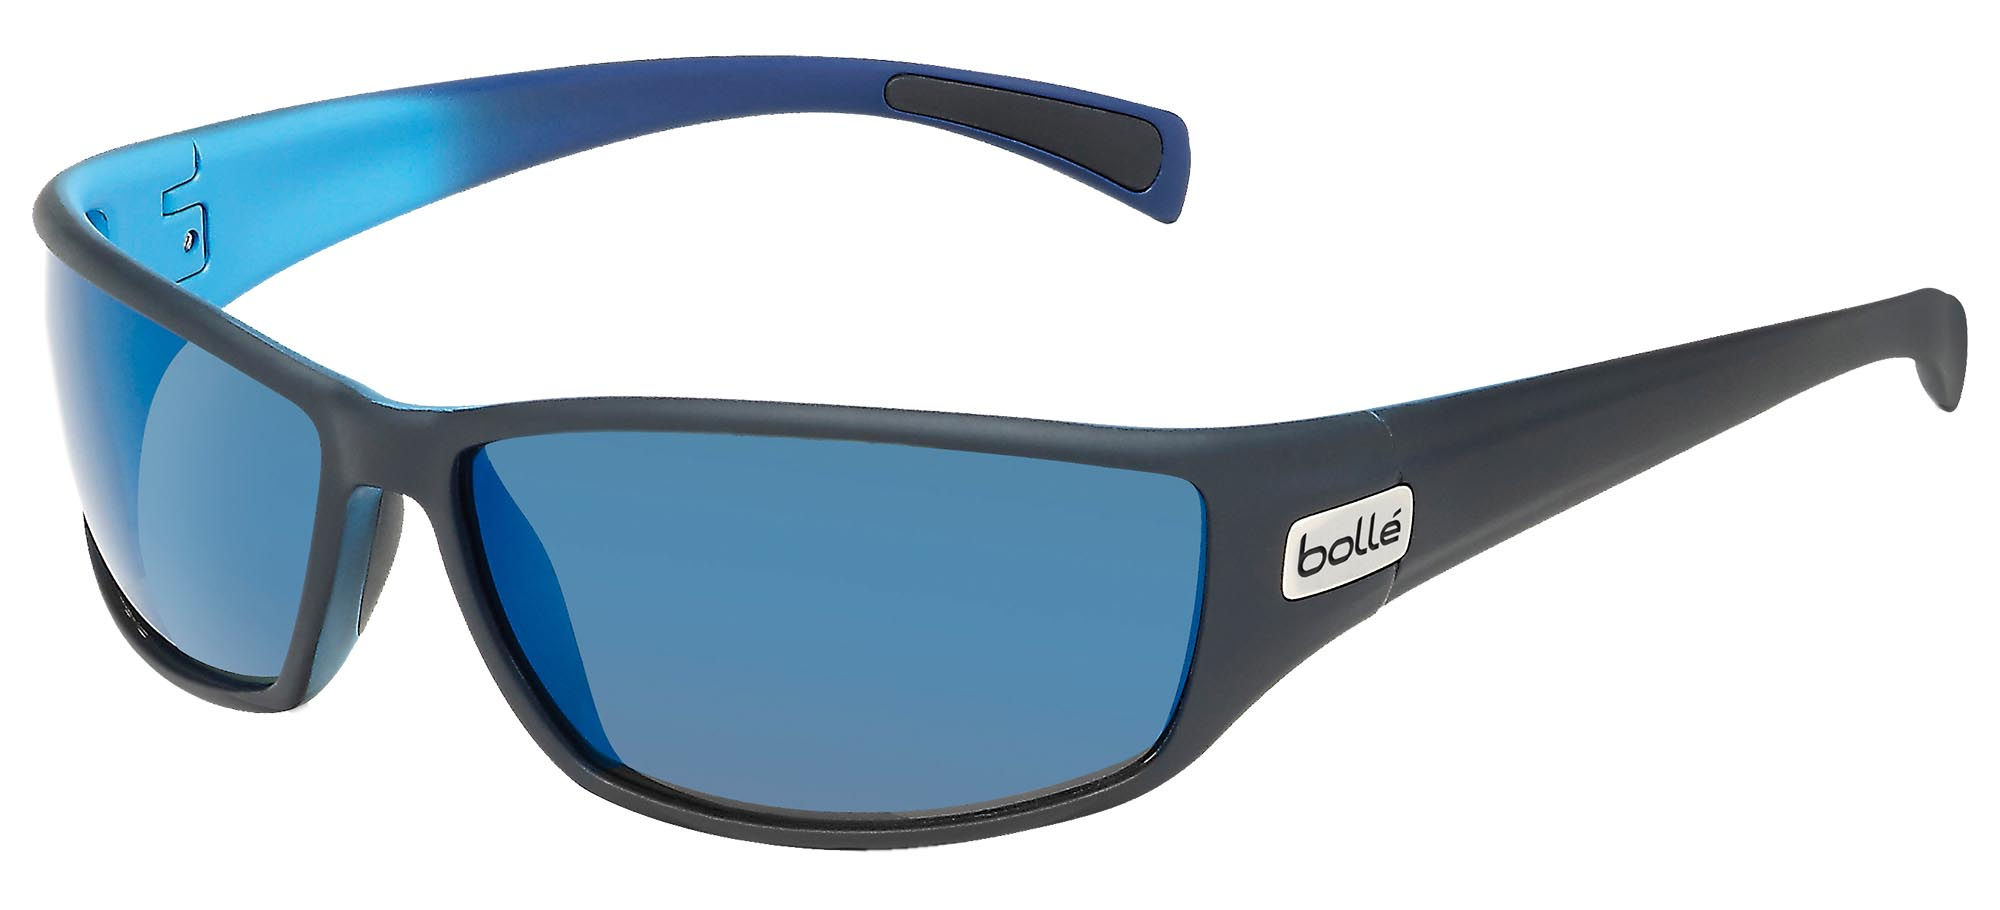 11672 Bolle Anaconda Sunglasses Matte Blue Frame w// Polarized TNS Gun Lens